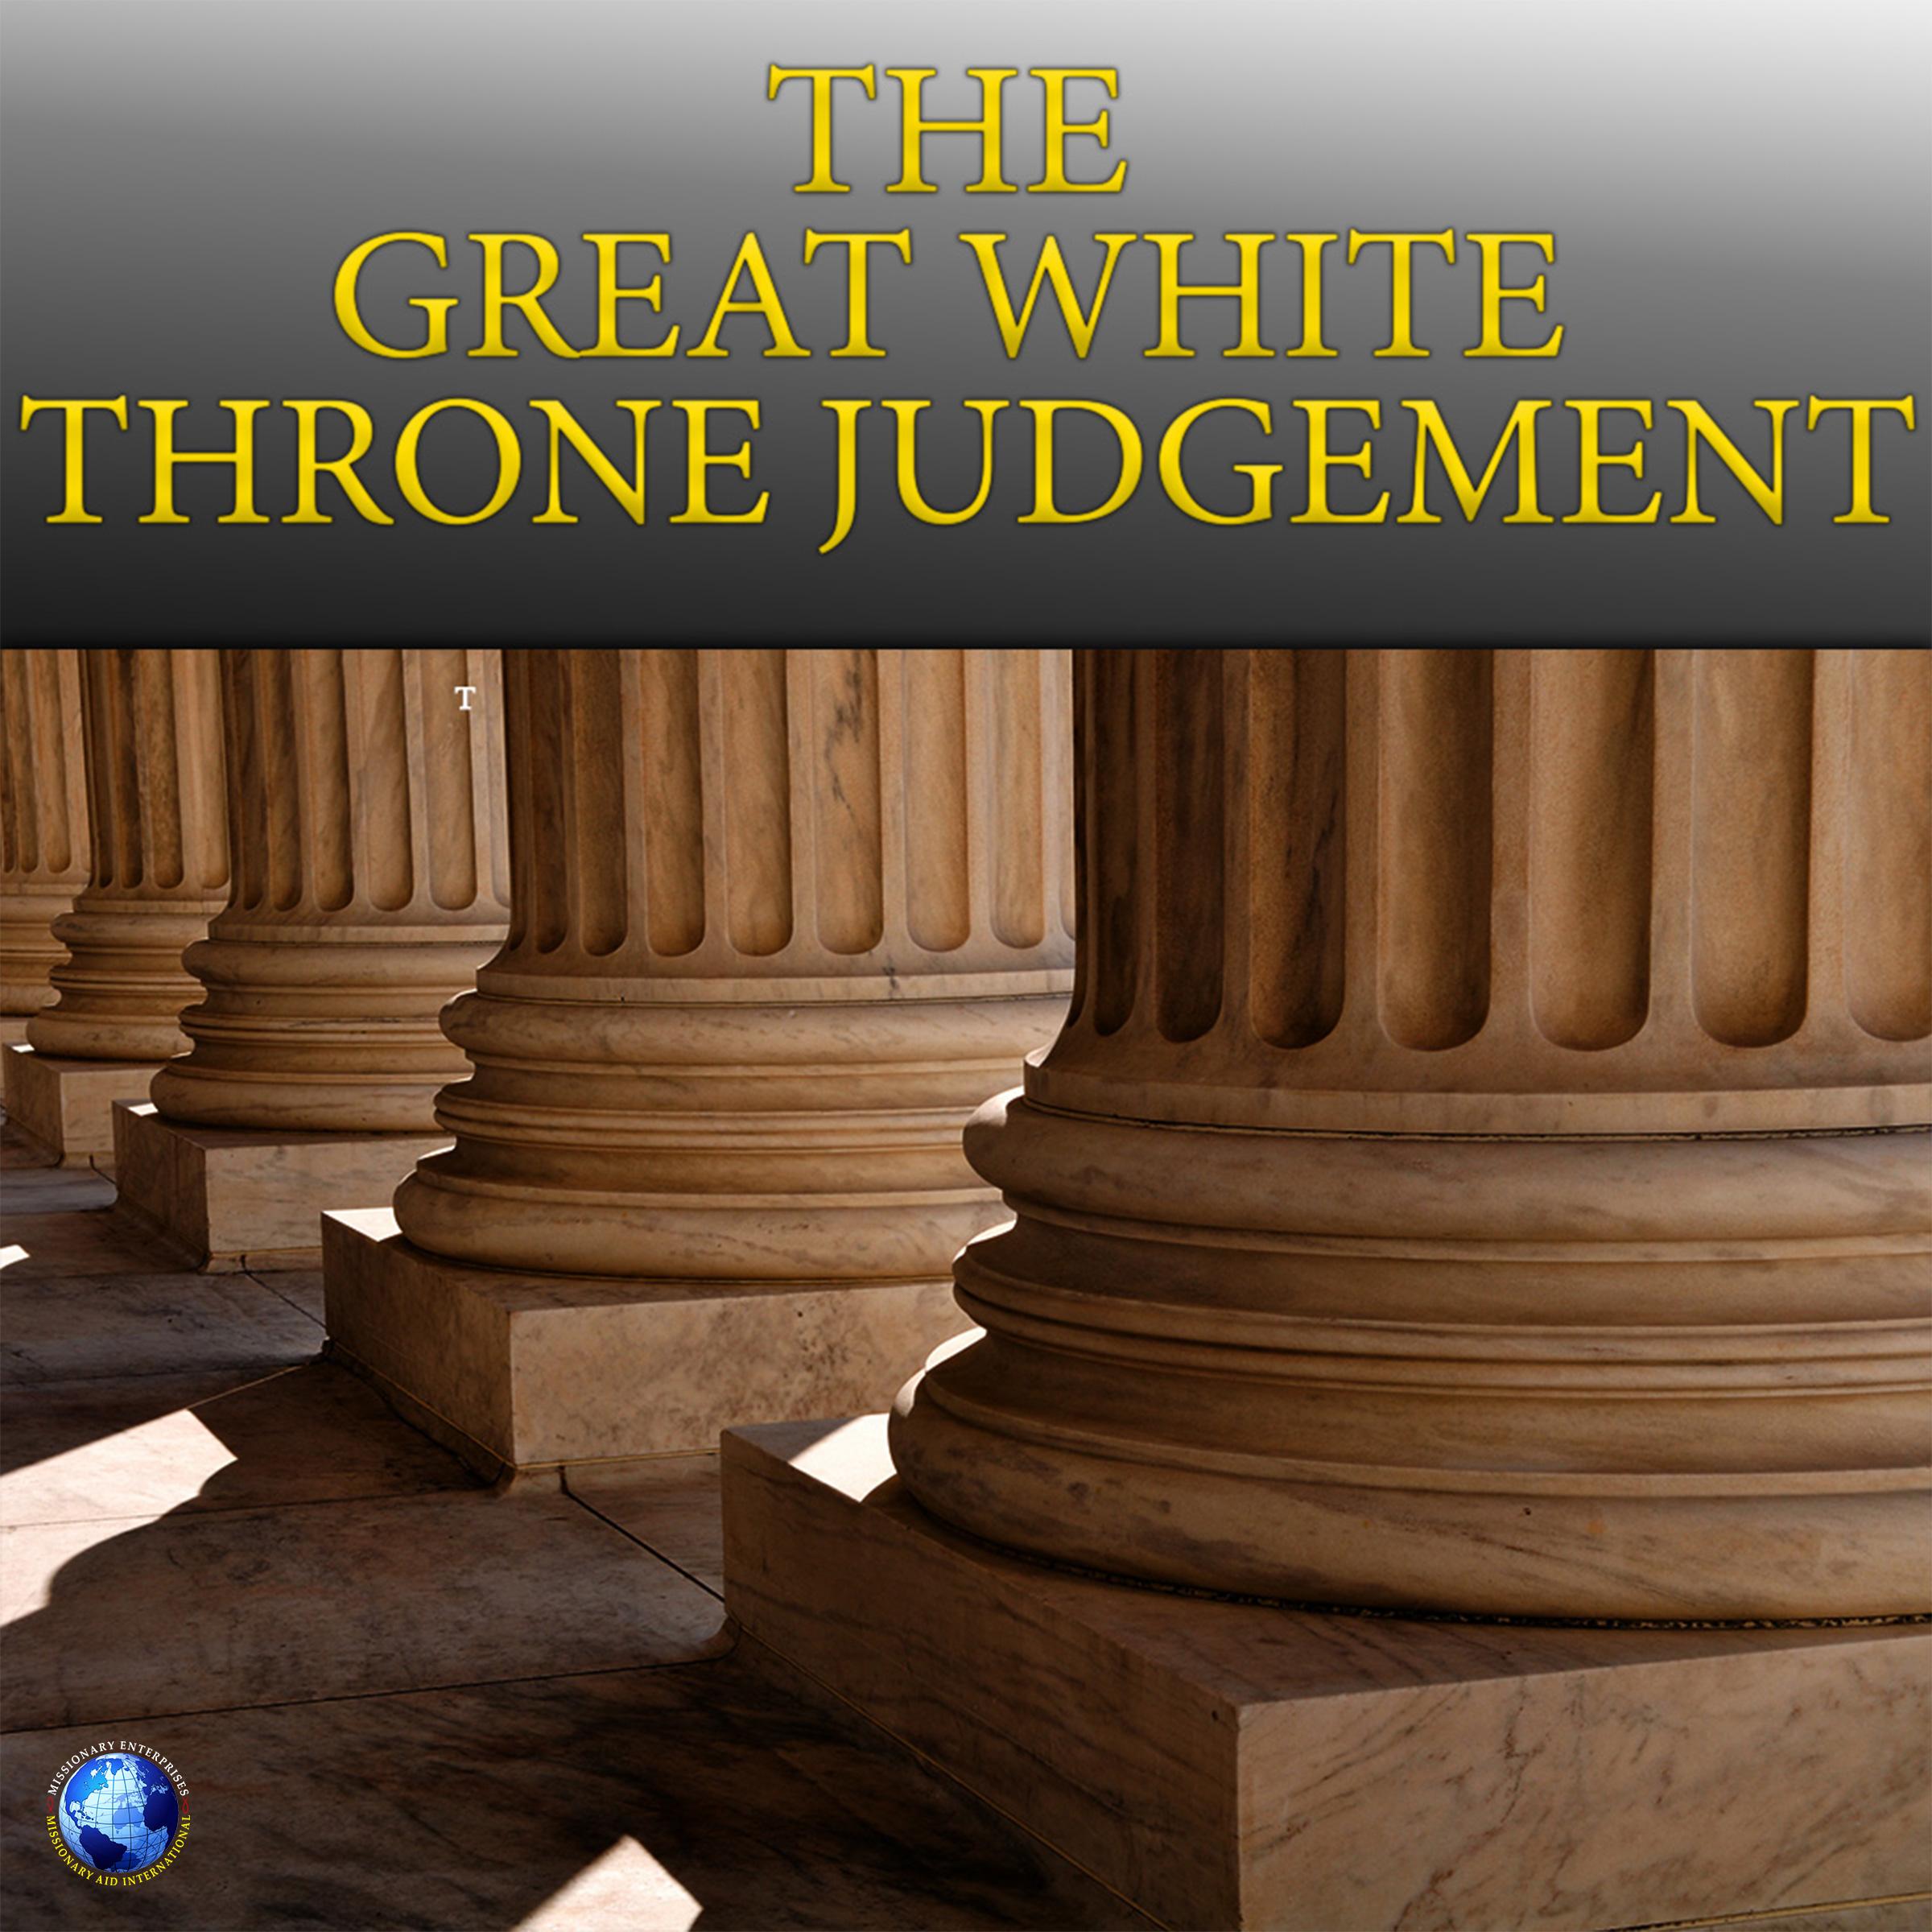 The Great White Throne Judgement